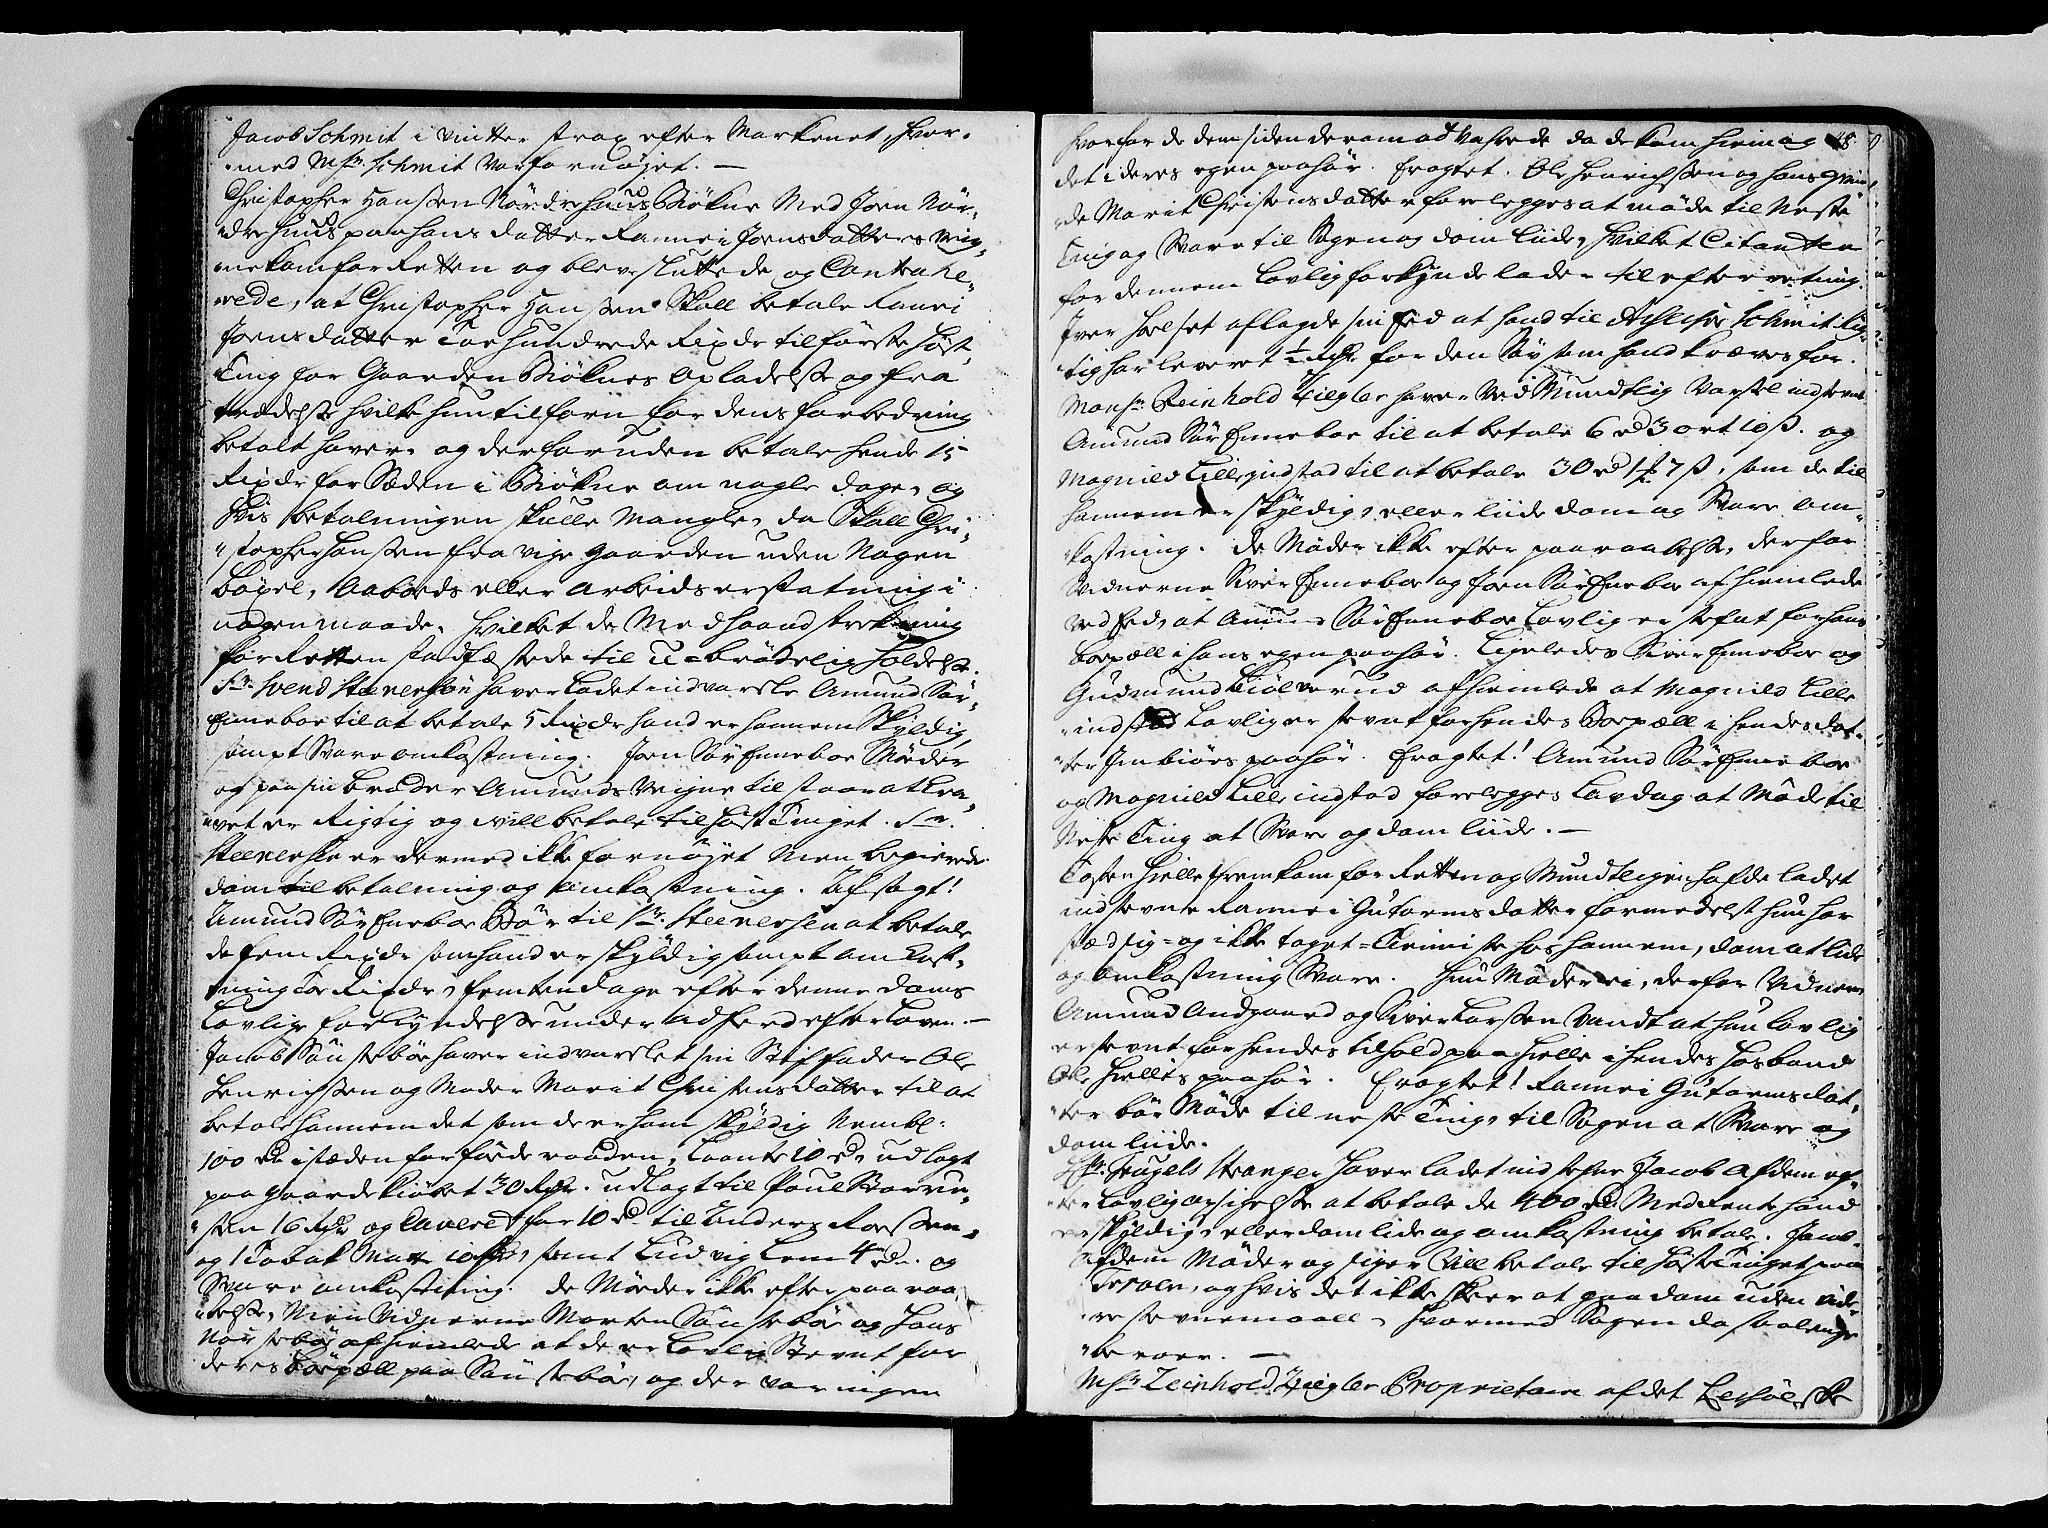 SAH, Sorenskriverier i Gudbrandsdalen, G/Gb/Gbc/L0008: Tingbok - Nord- og Sør-Gudbrandsdal, 1720-1722, s. 47b-48a